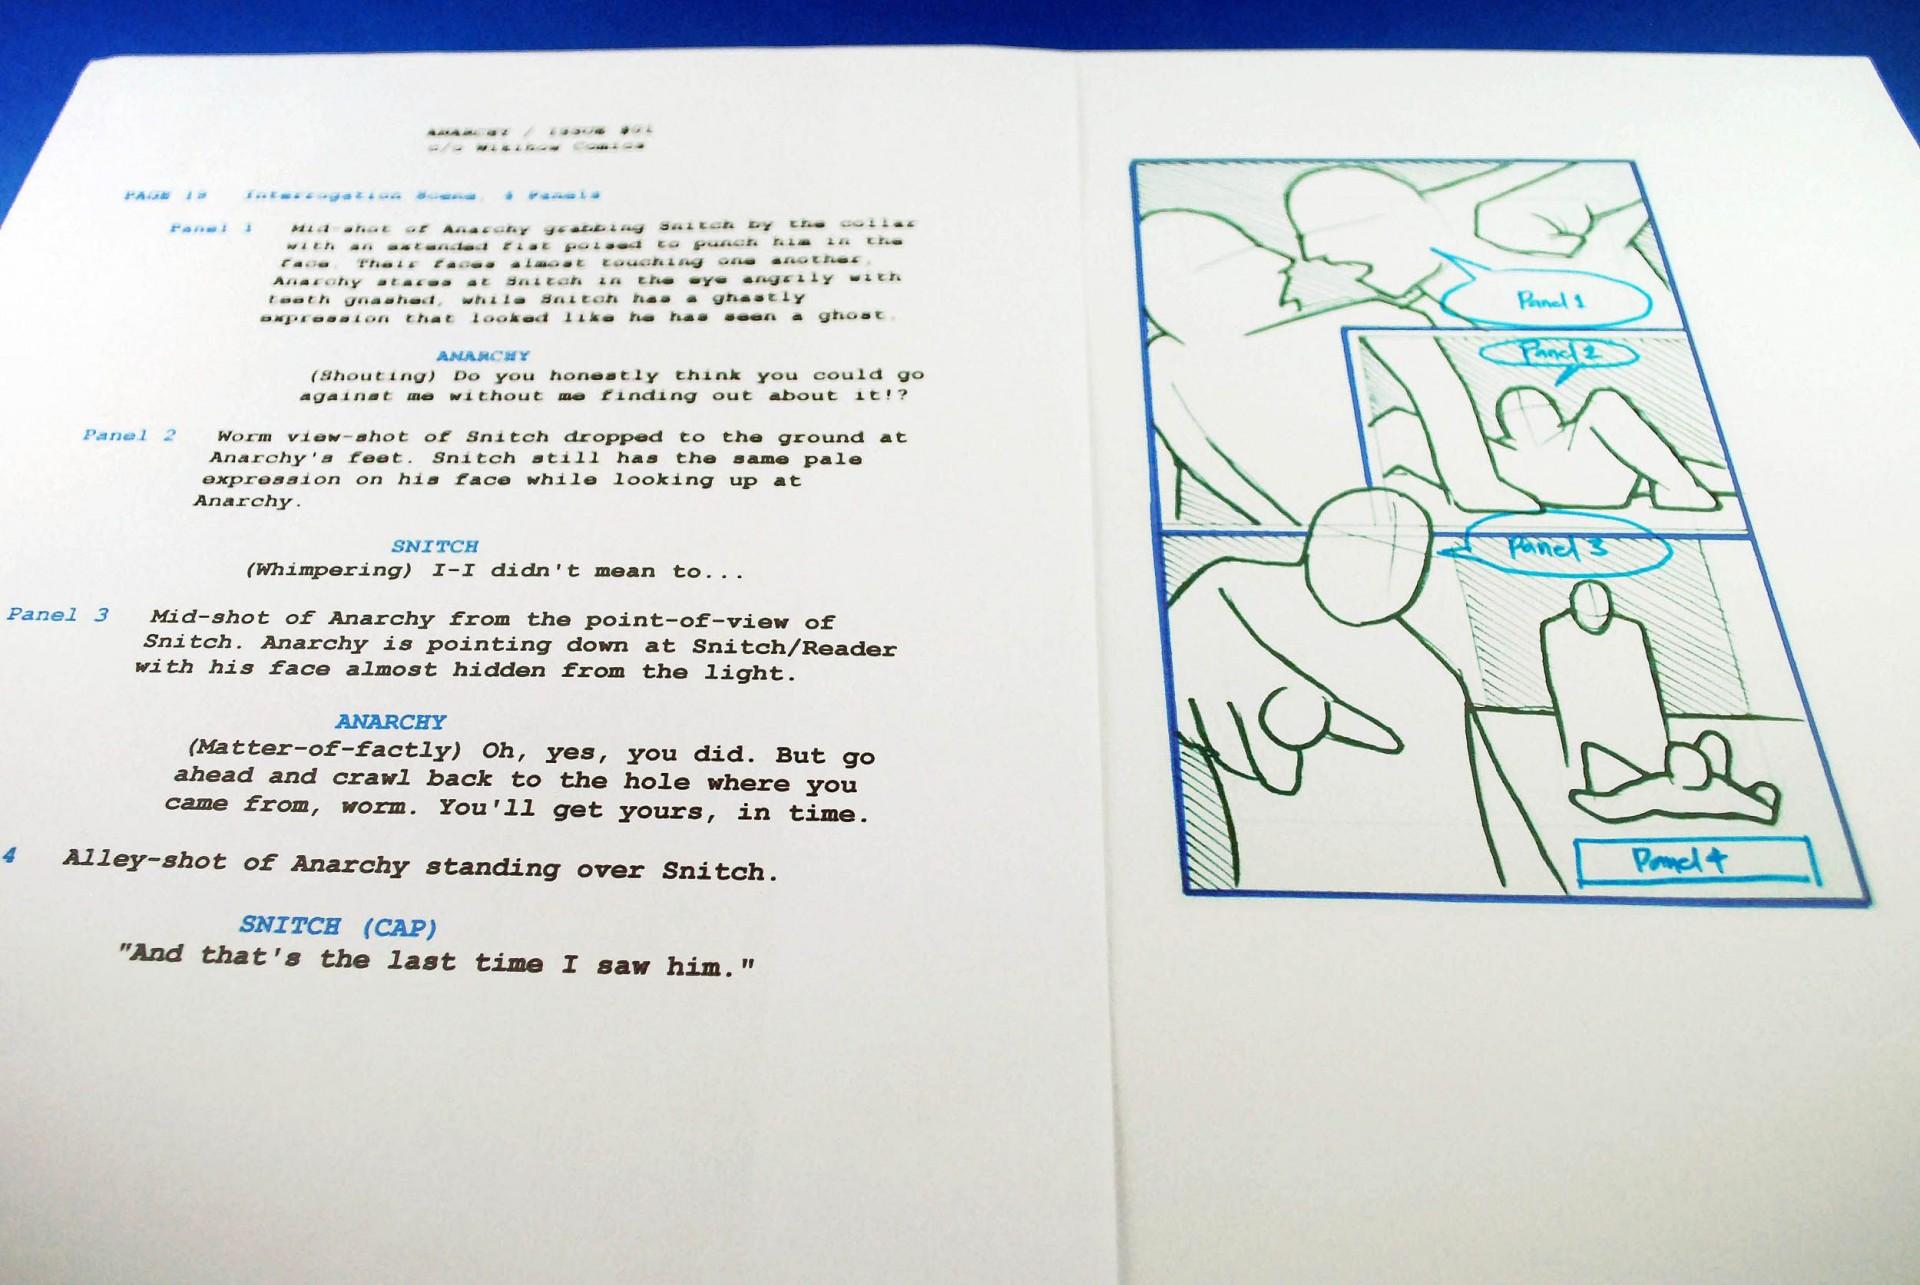 009 Sensational Comic Book Script Writing Format High Resolution  Example1920